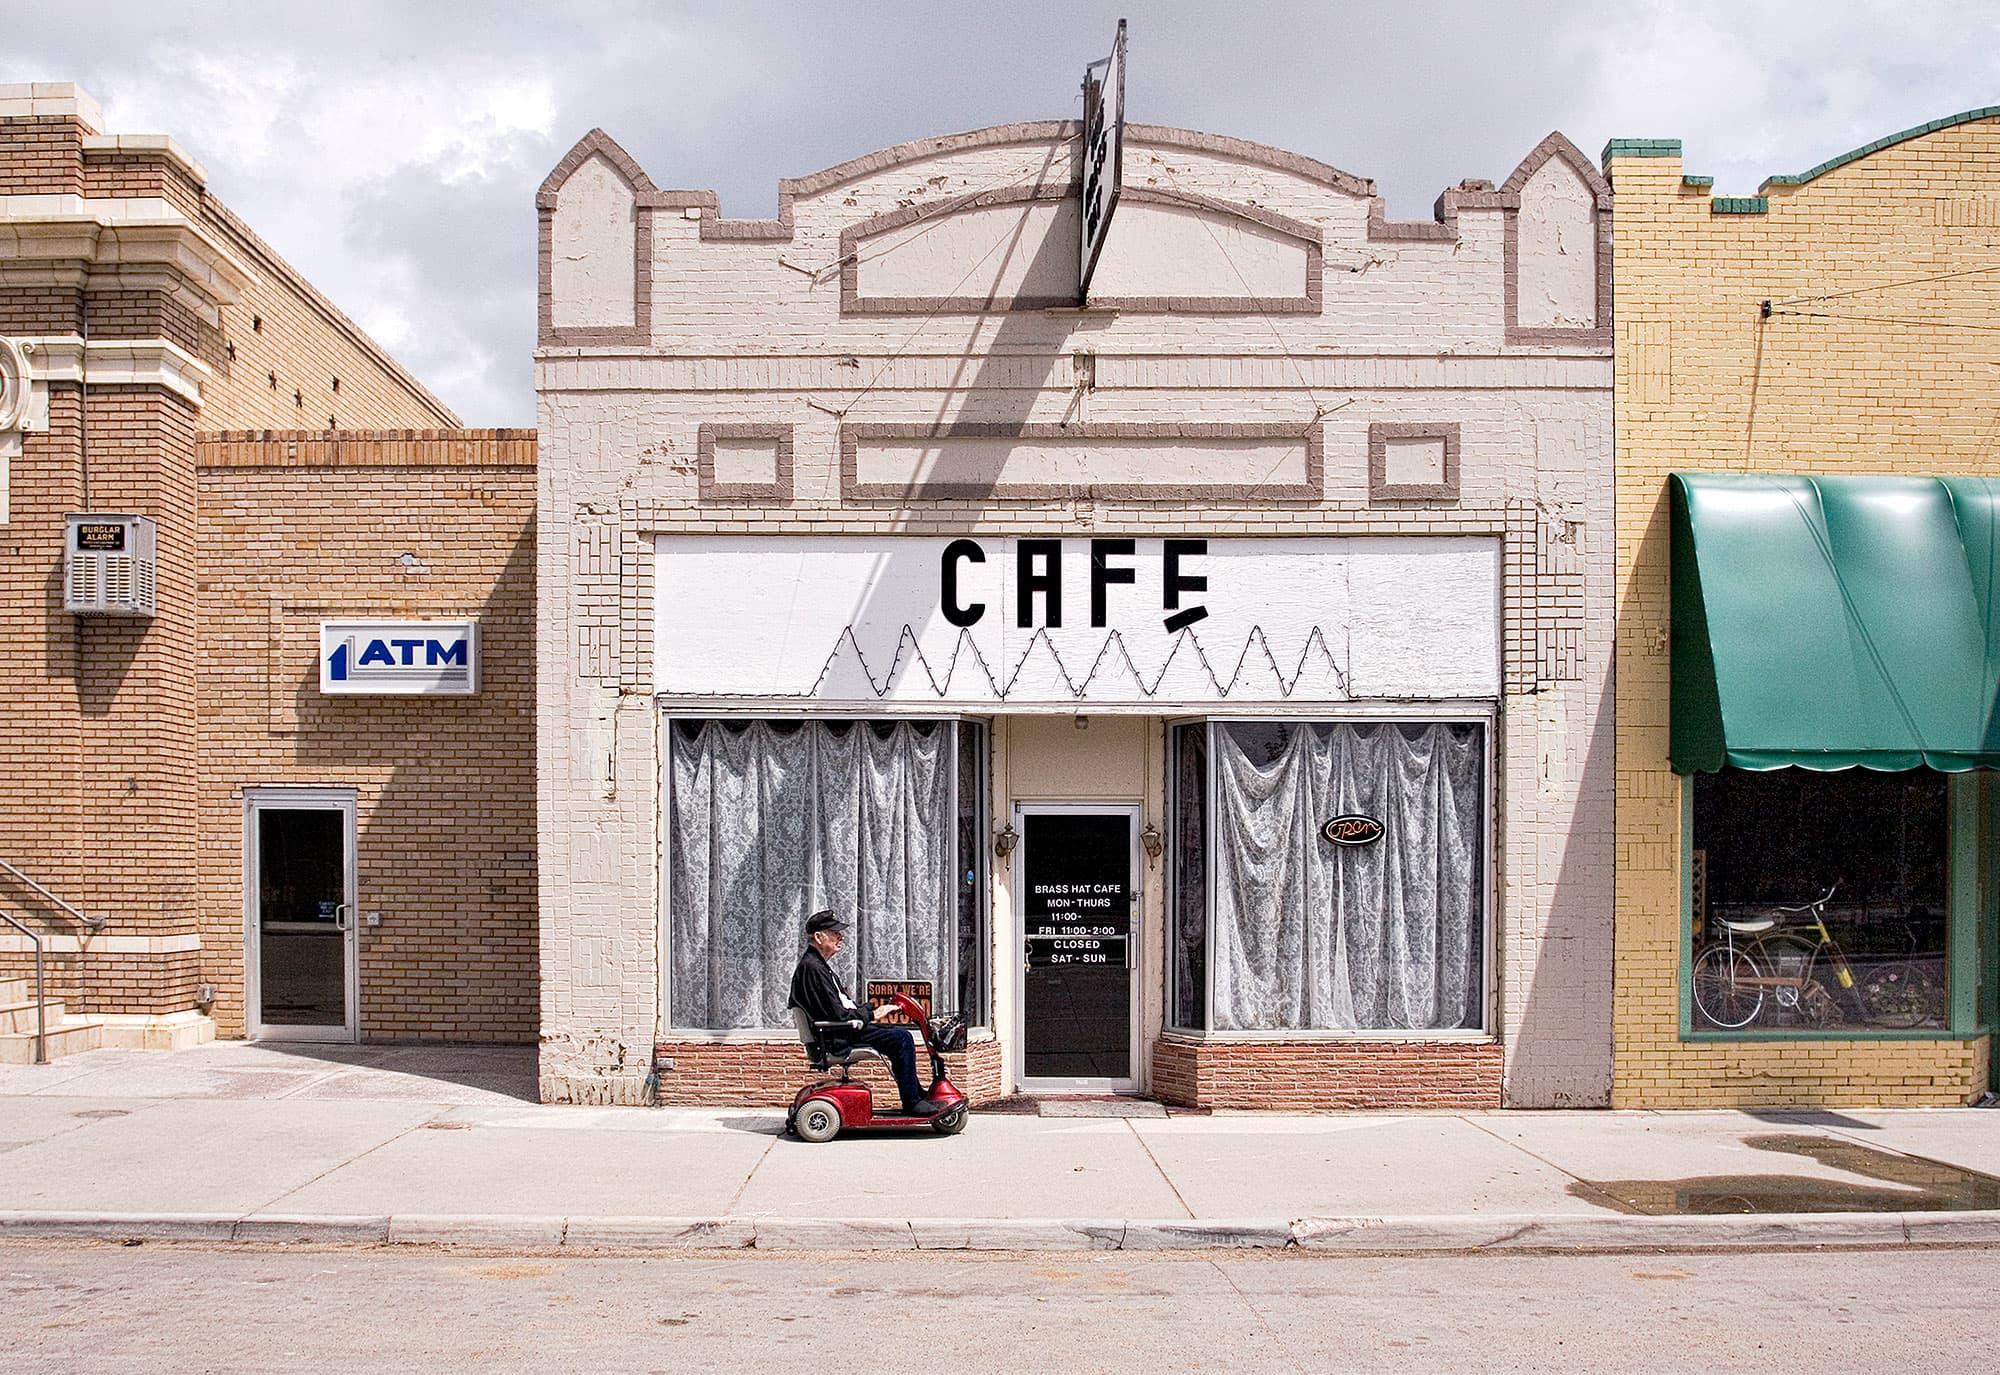 arthur-lazar-Brass-Hat-Cafe-Colorado-2006